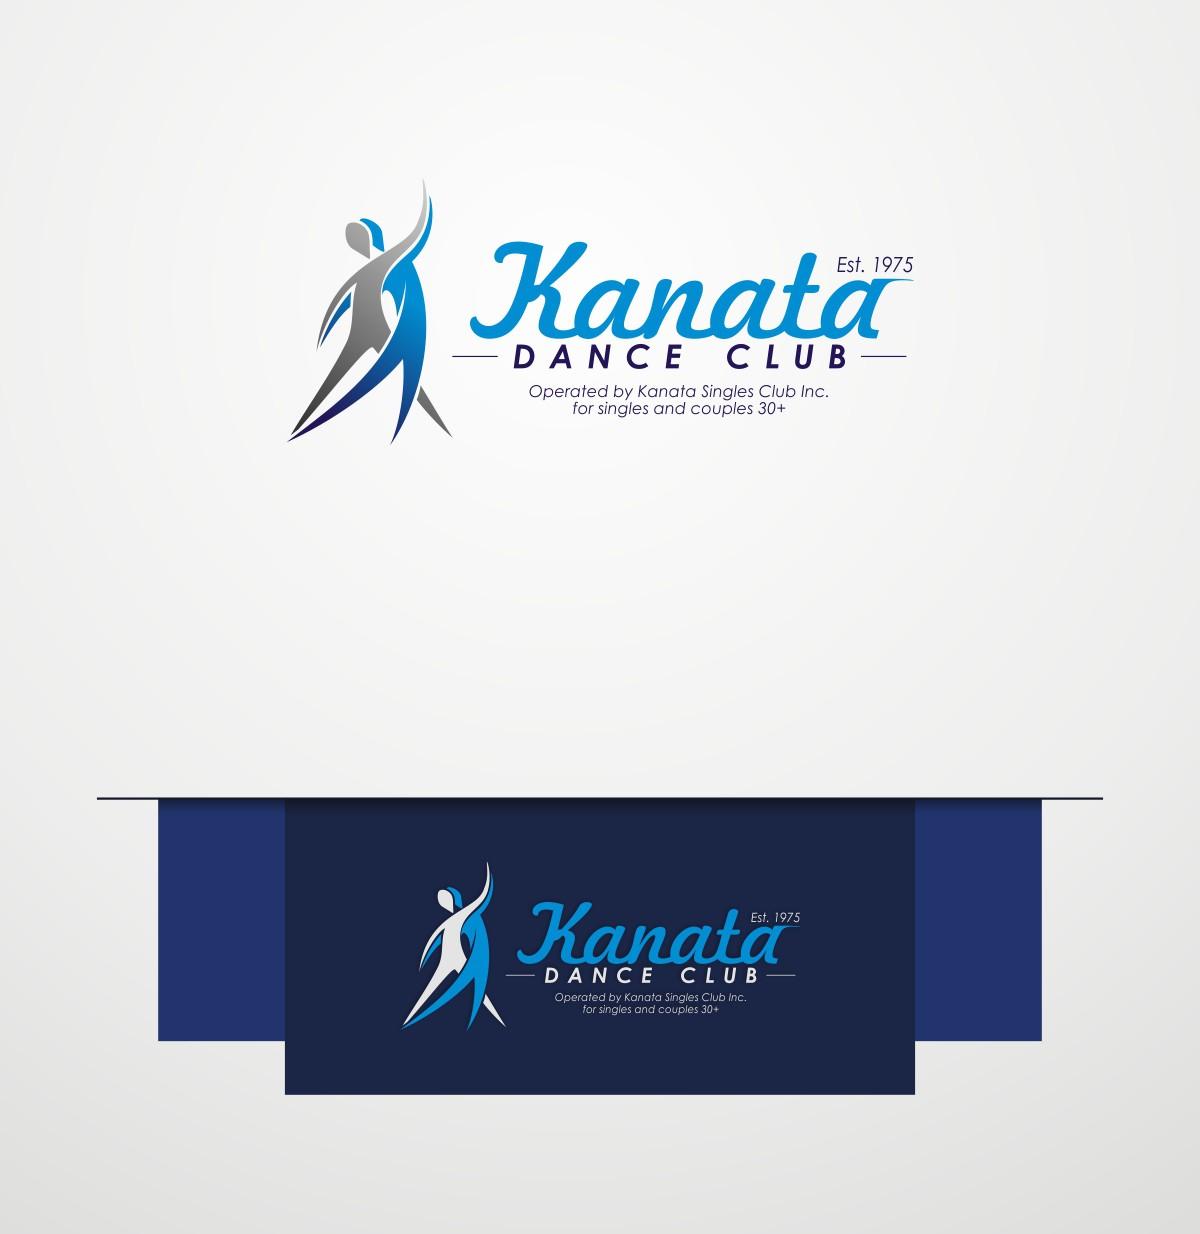 Kanata Dance Club  needs a new logo